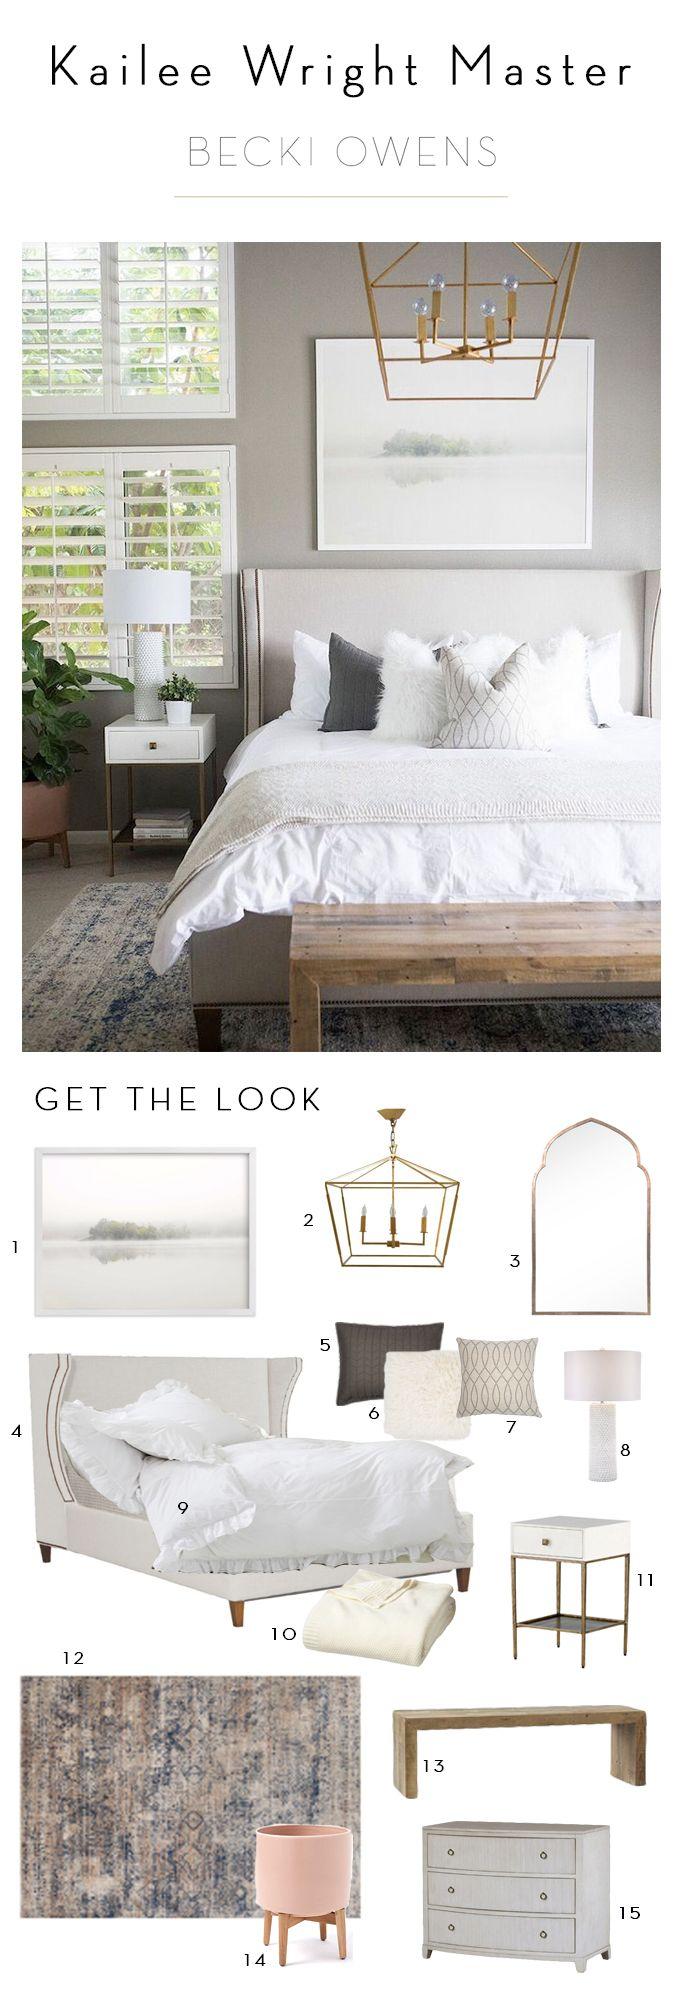 Simple Bedroom Updates 25+ best simple bedrooms ideas on pinterest | simple bedroom decor